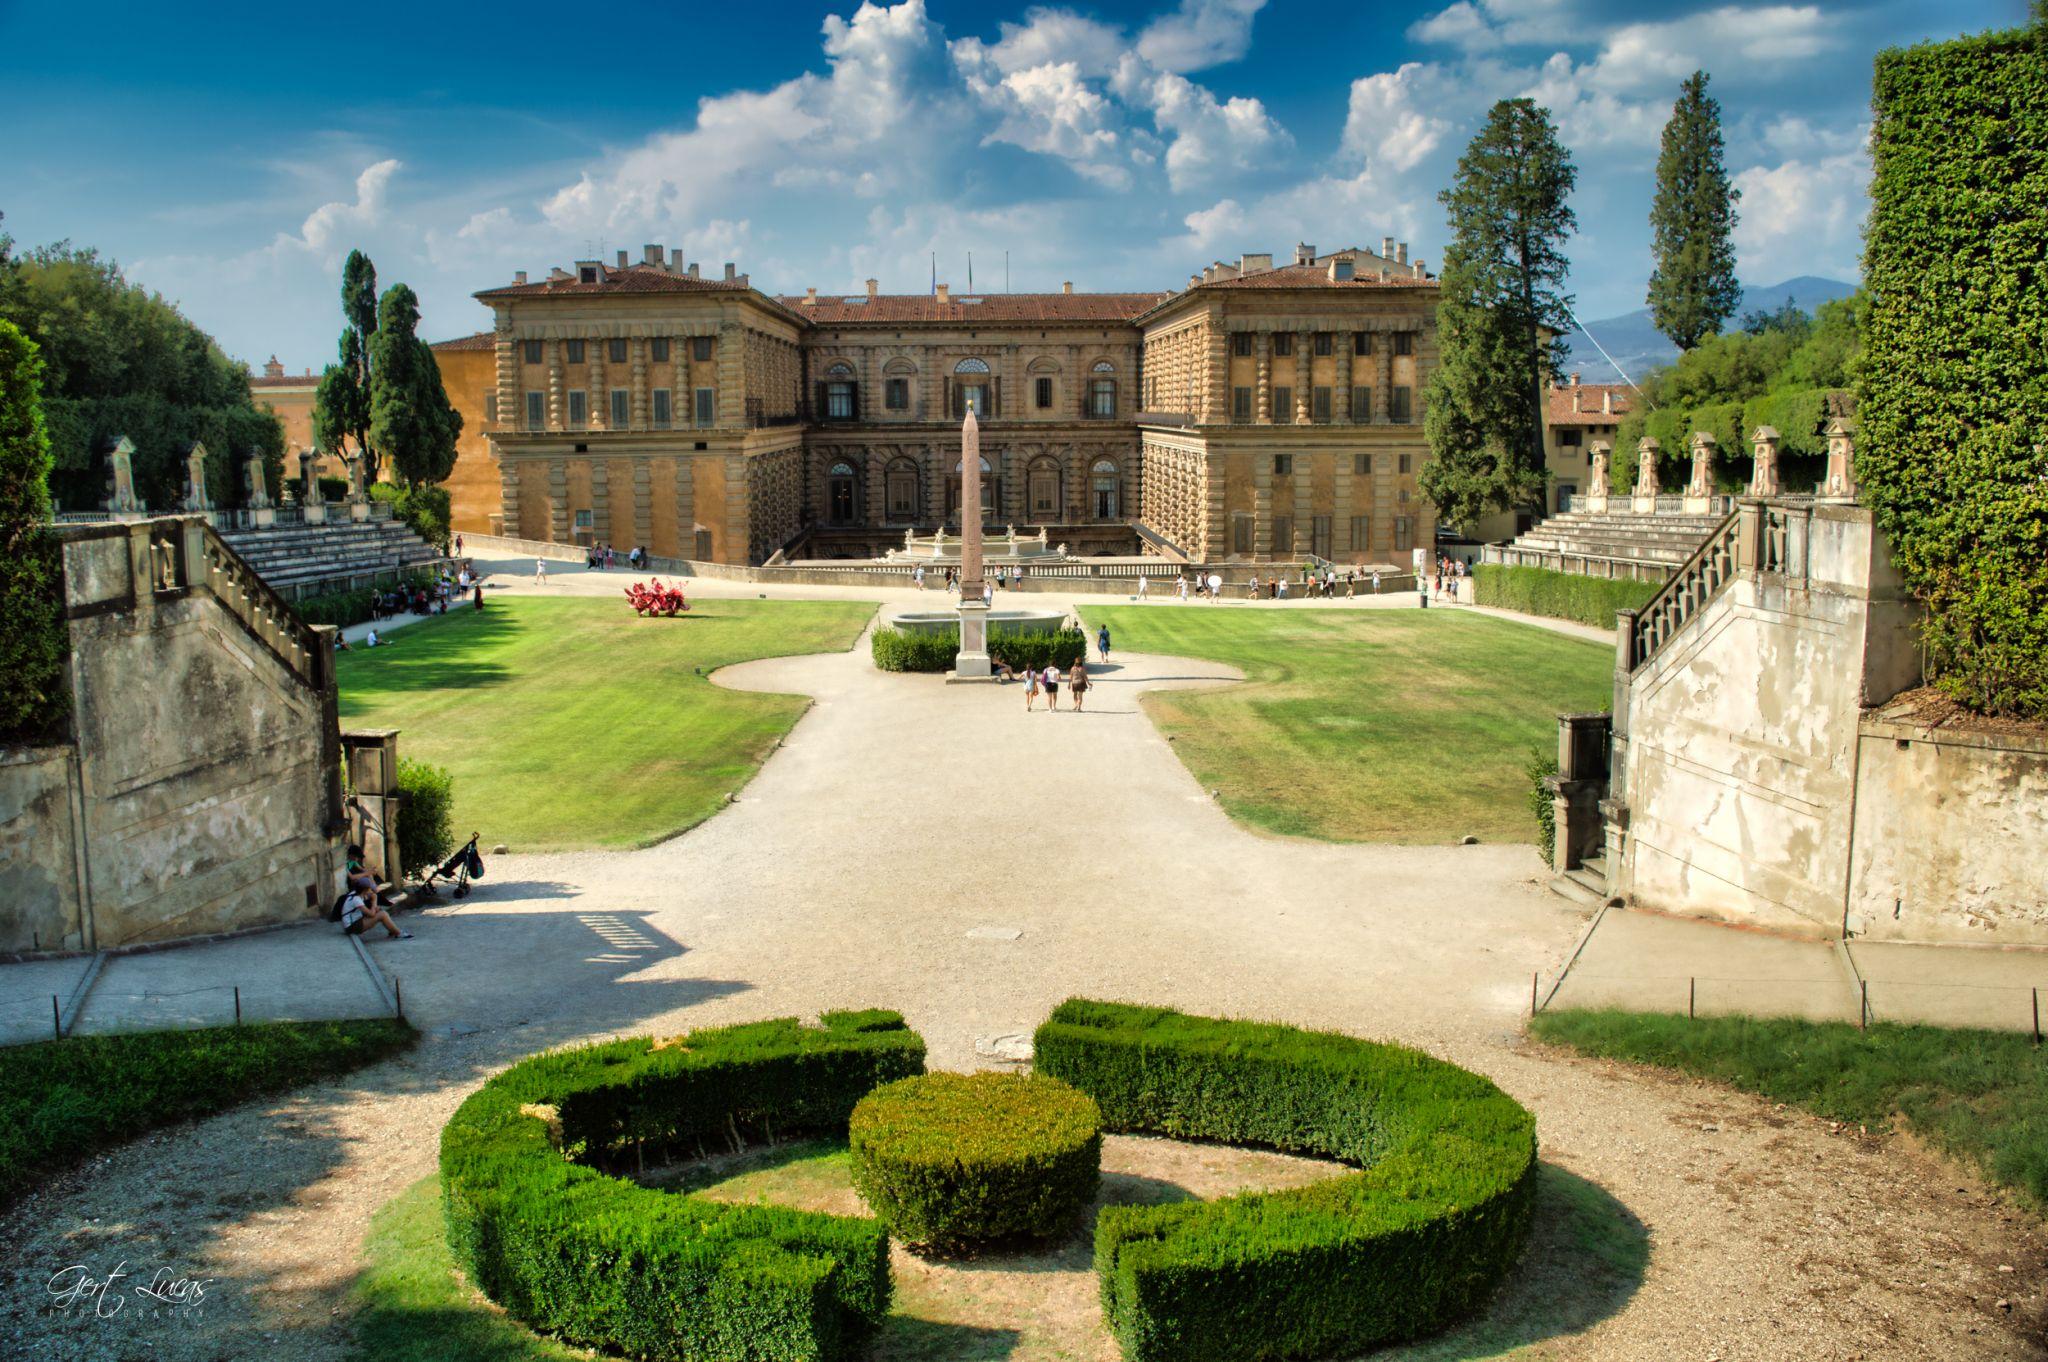 Giardino Di Boboli - Palazzo Pitti, Italy